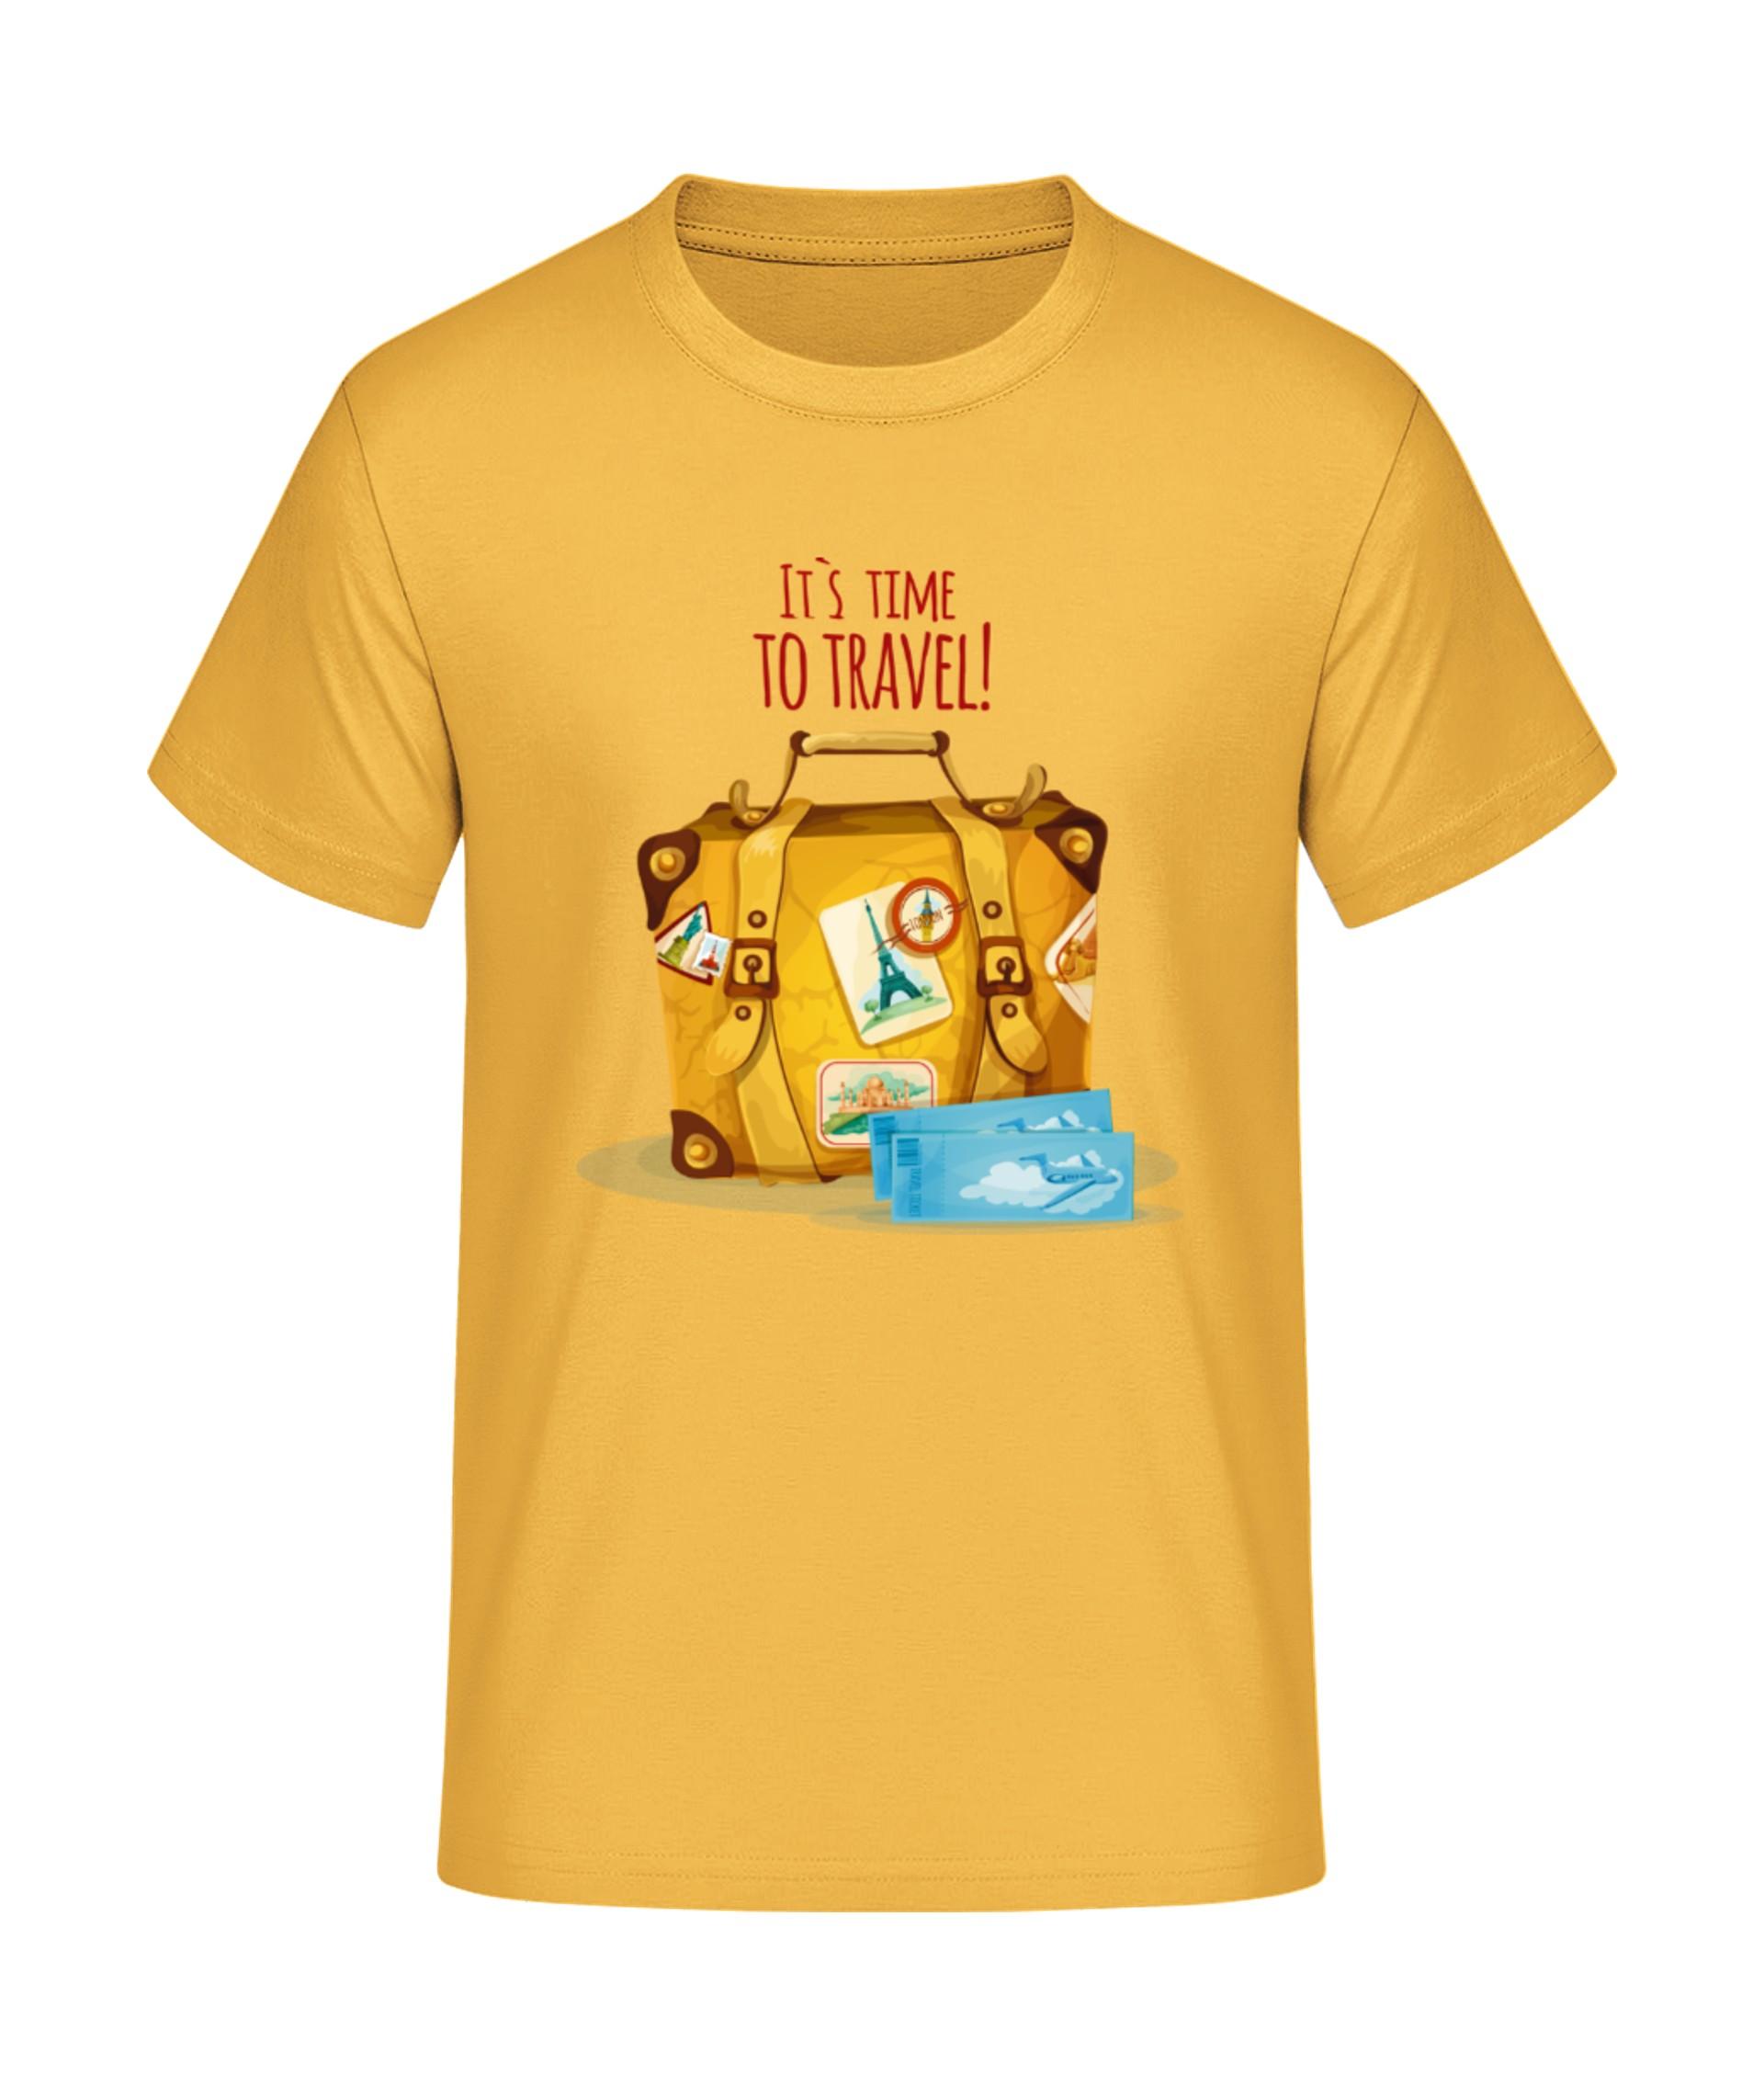 pick up 518b5 16e50 Time to Travel - T-Shirt Druck